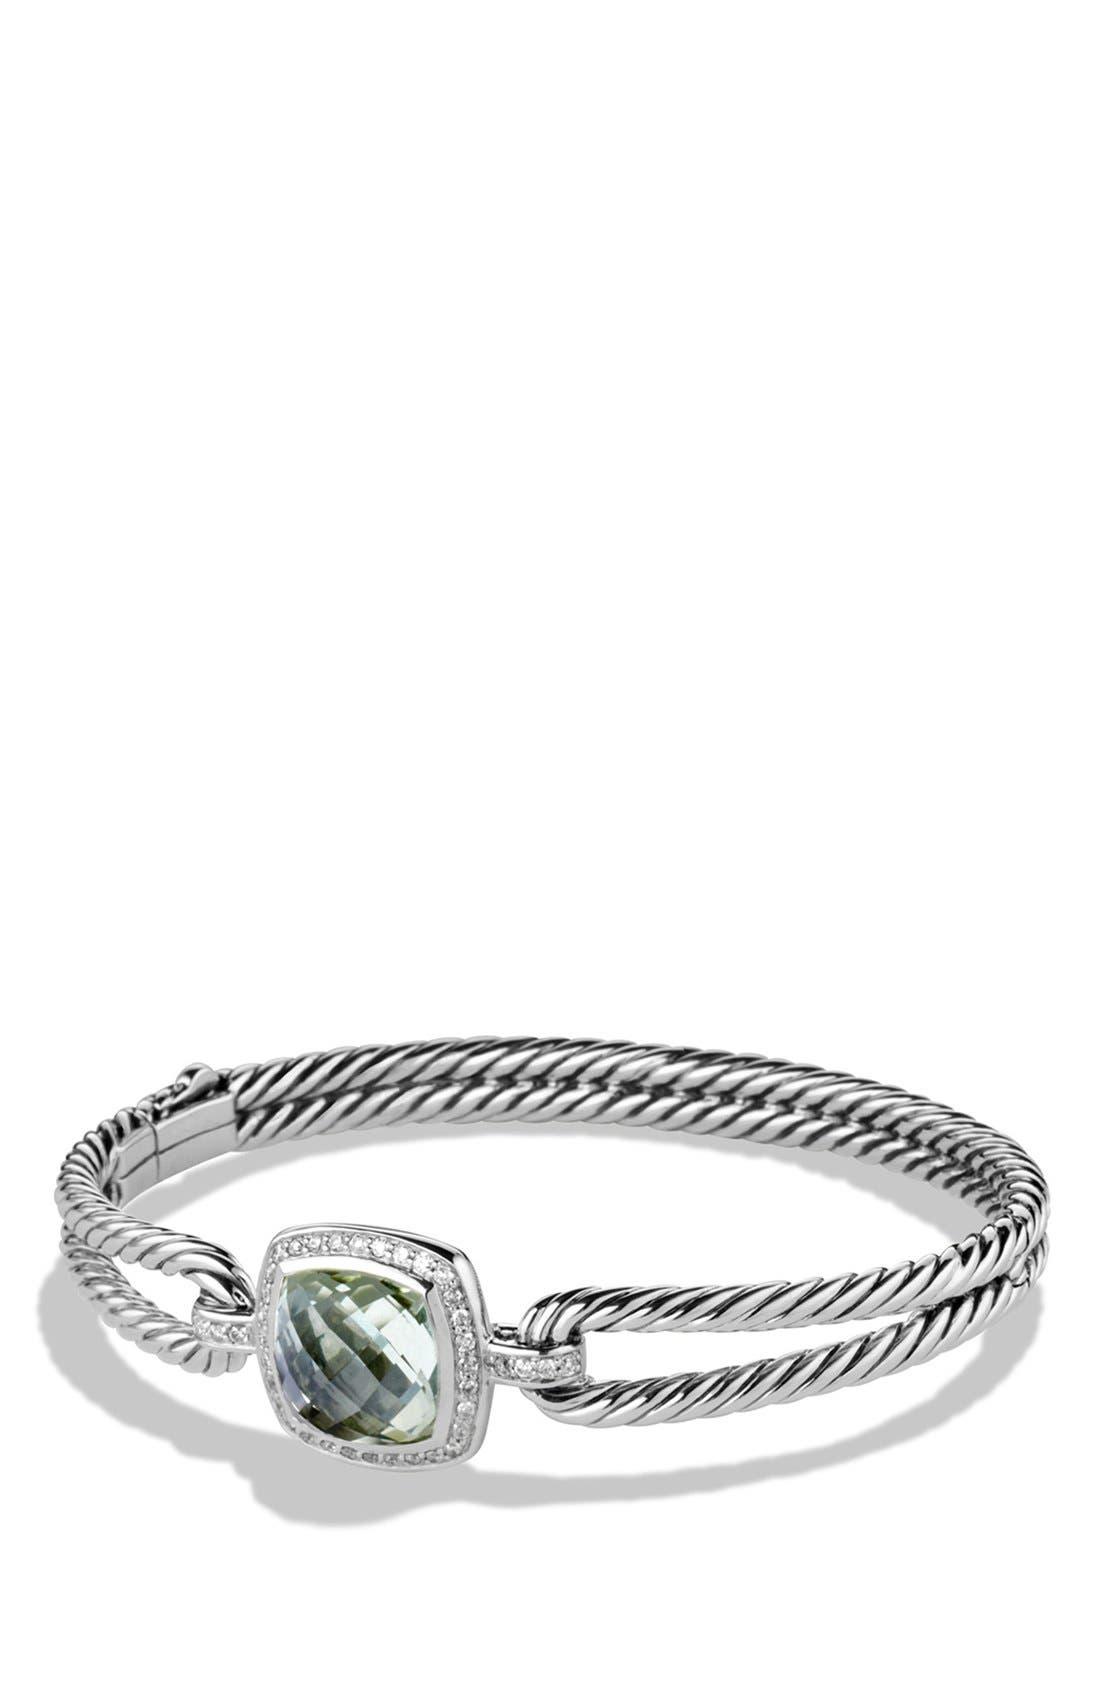 Alternate Image 1 Selected - David Yurman 'Albion' Bracelet with Semiprecious Stone and Diamonds